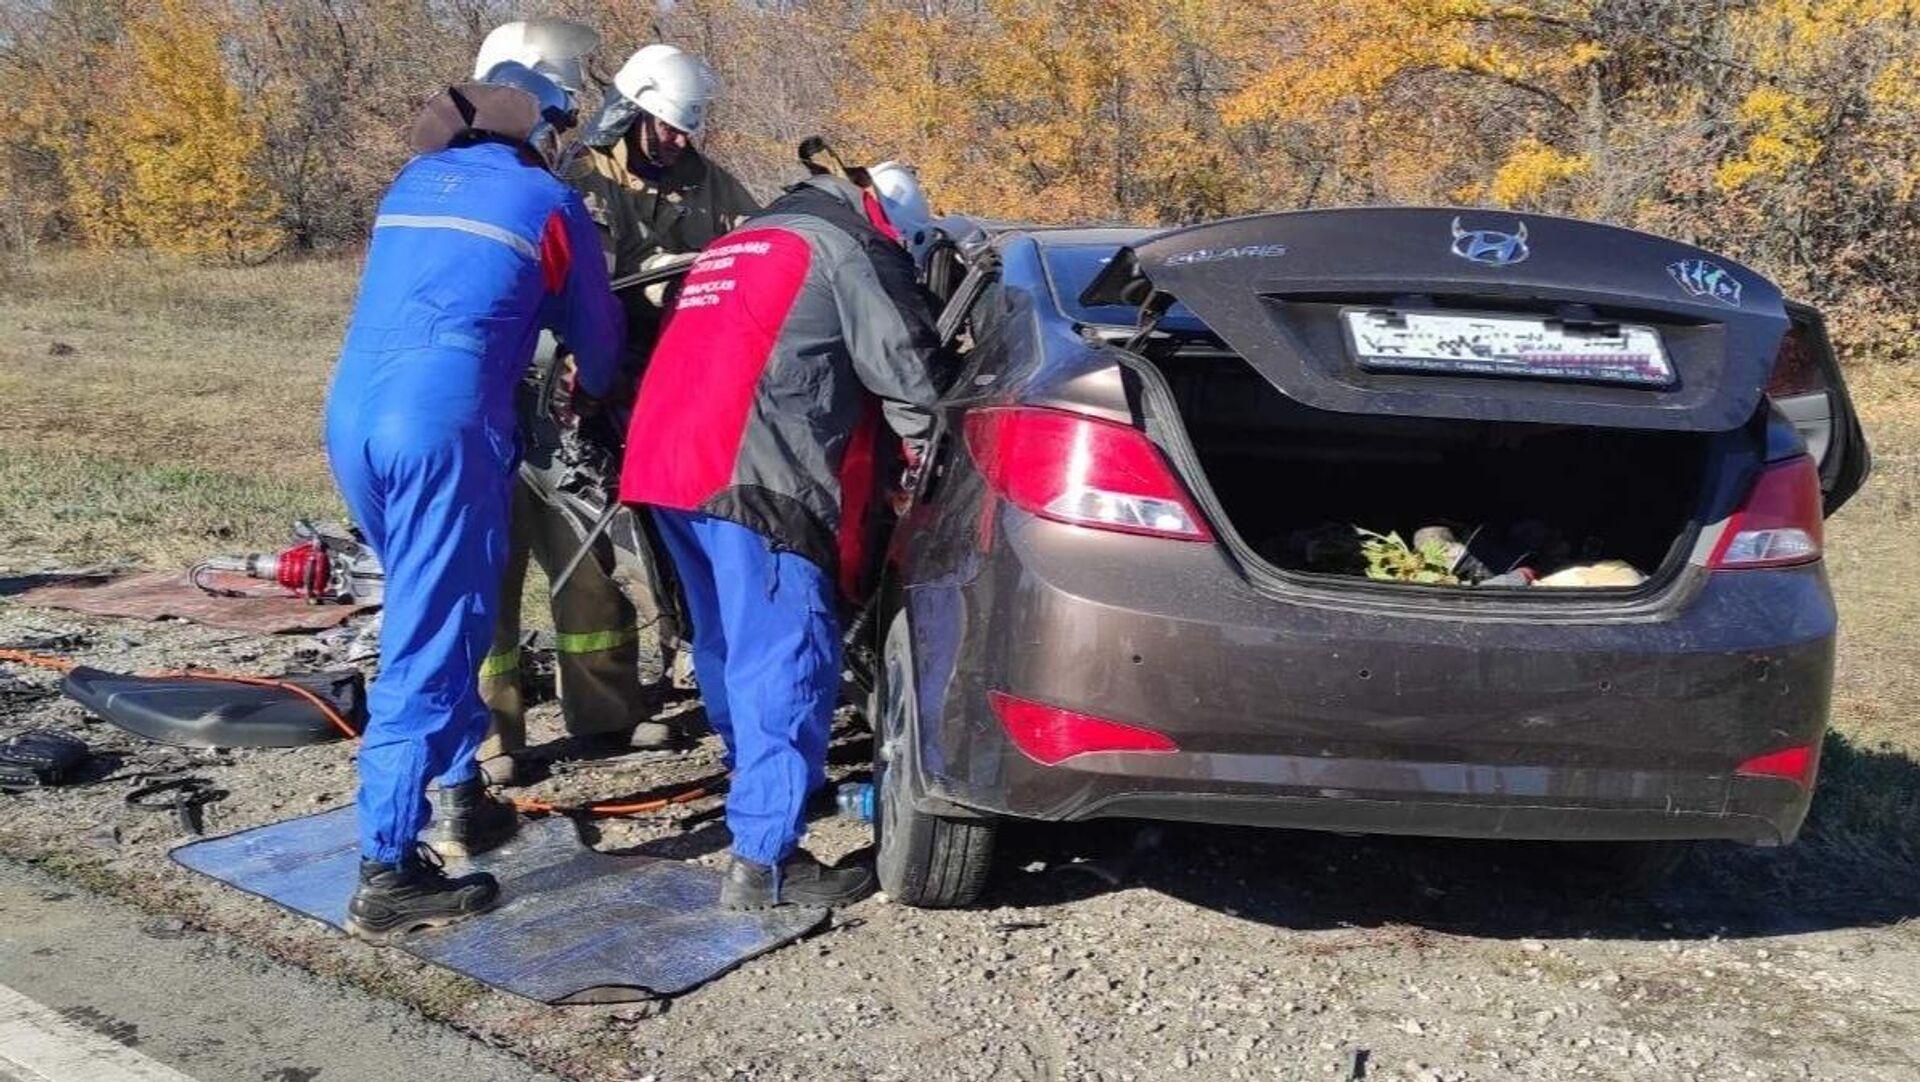 ДТП на восьмом километре автодороги М-5 Урал под Самарой1